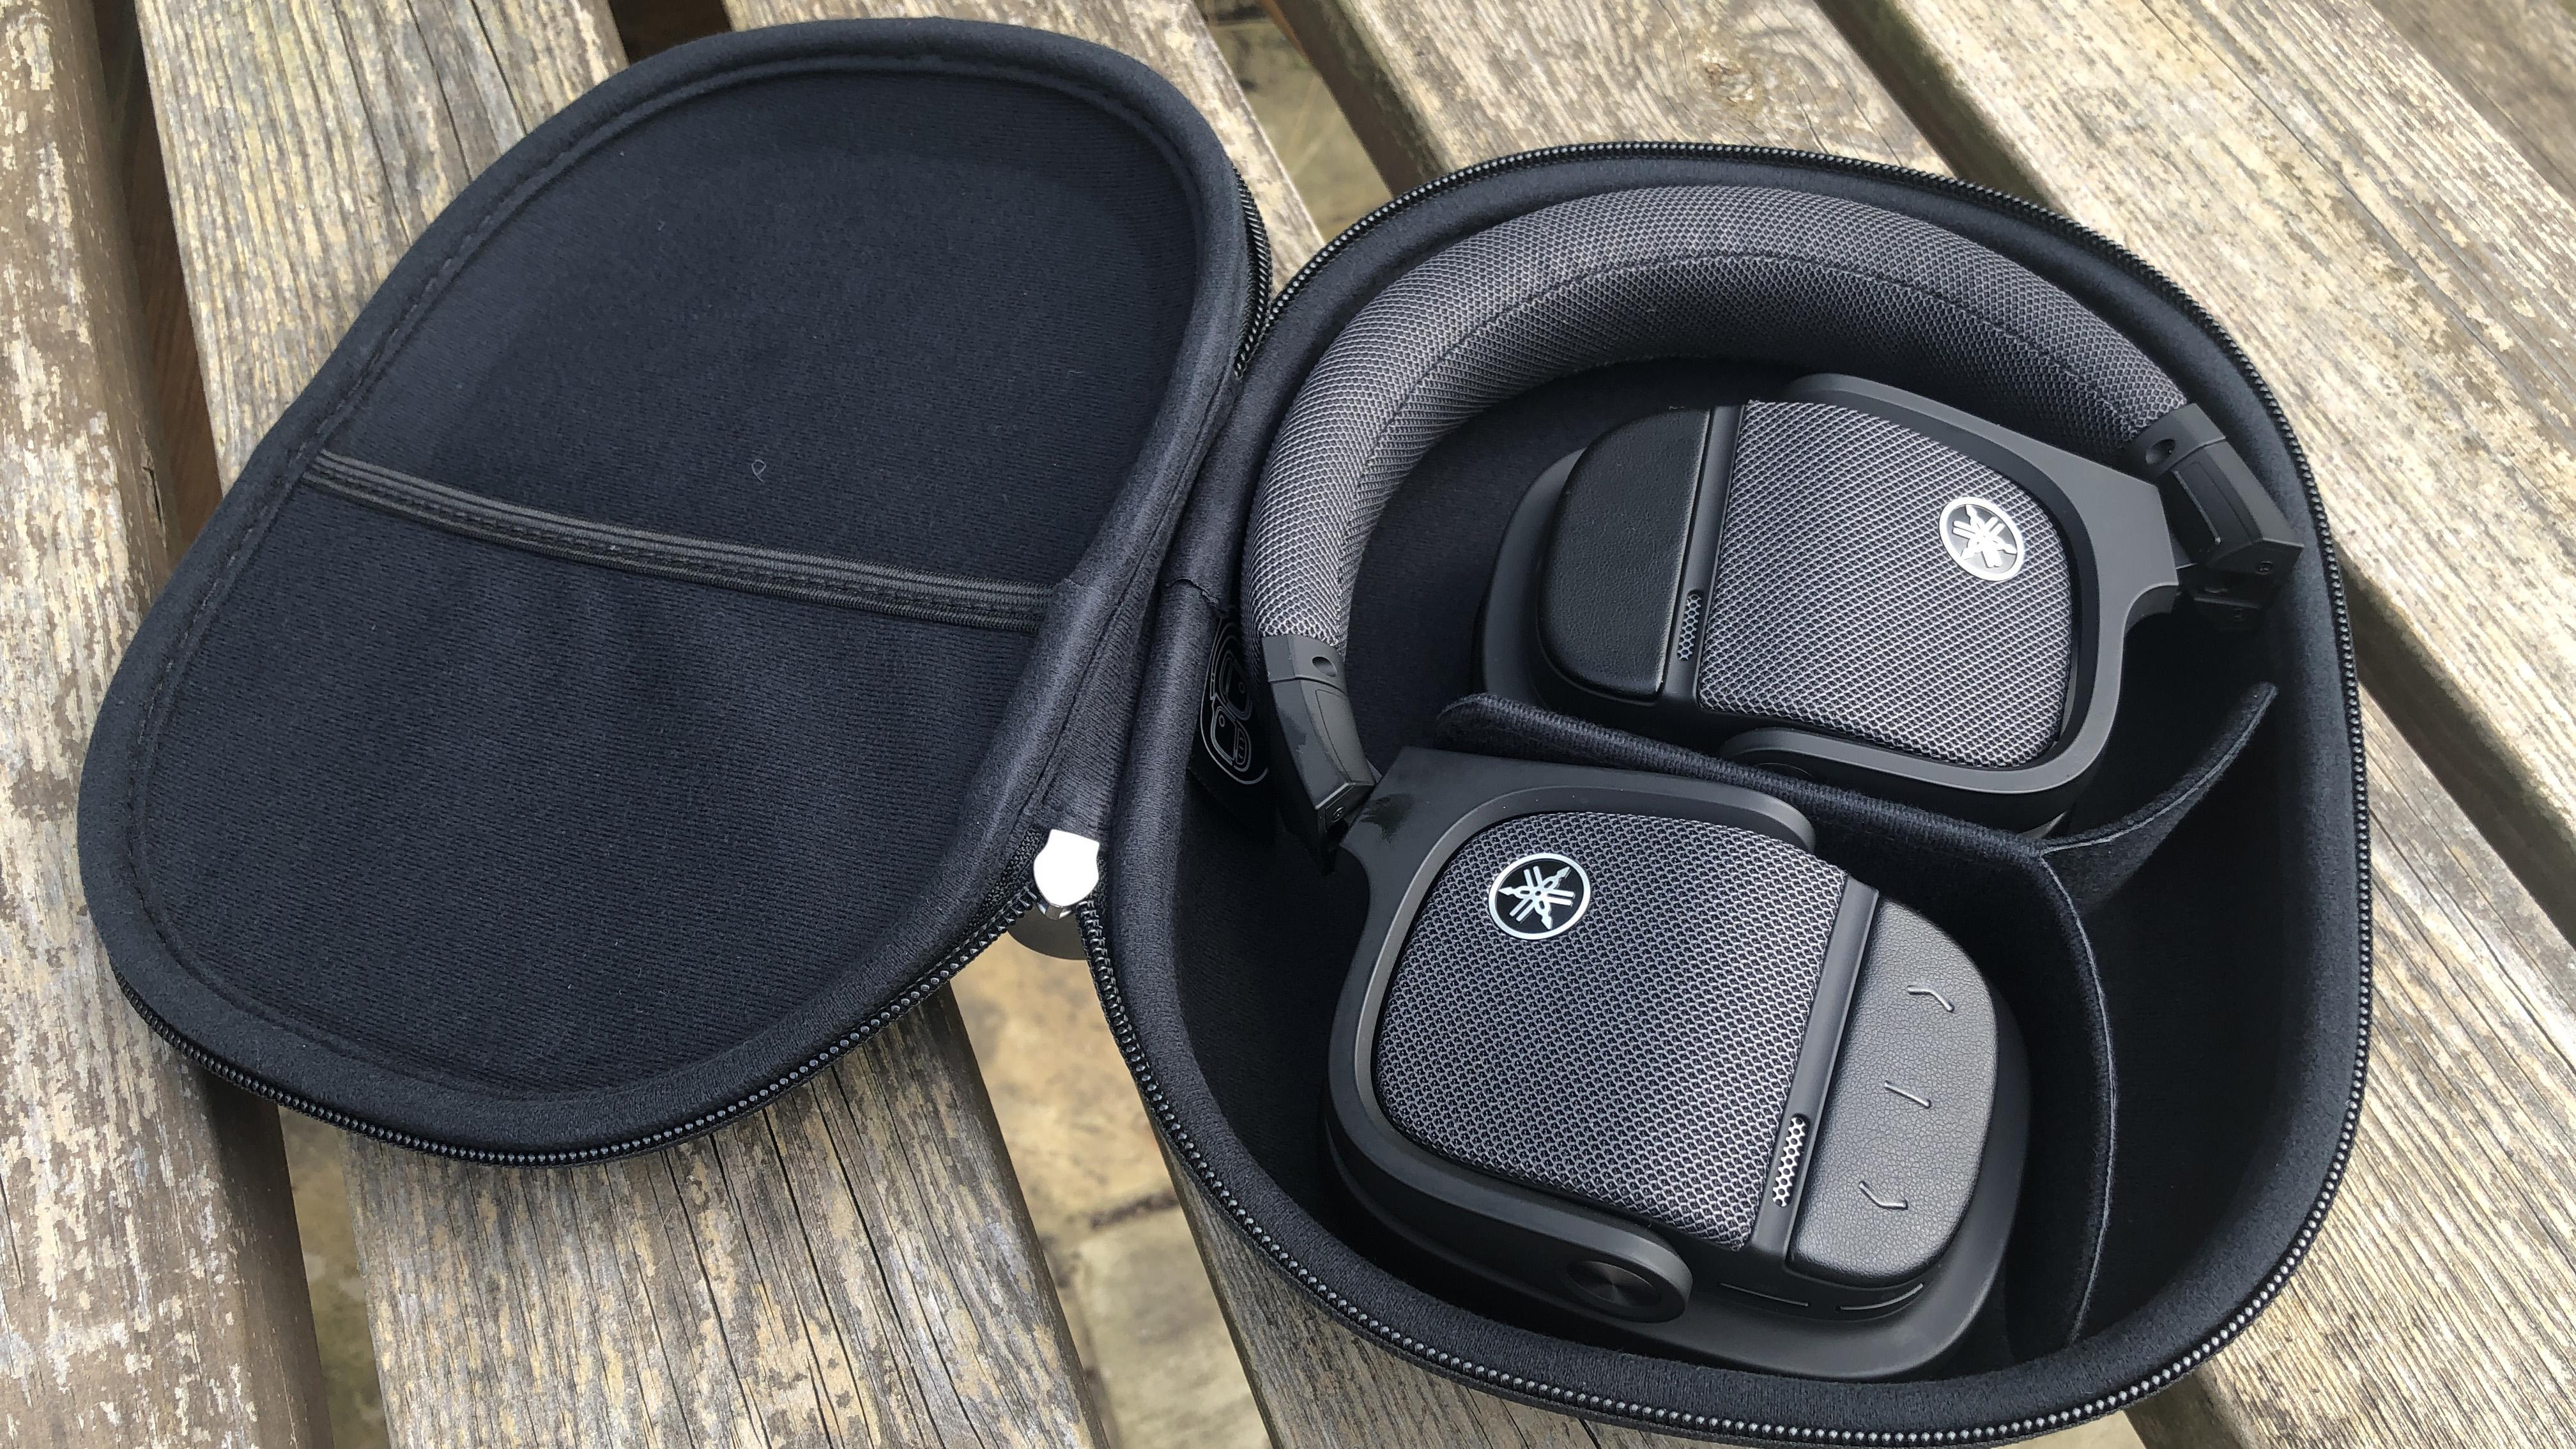 a closeup of the yamaha yh-l700a headphones